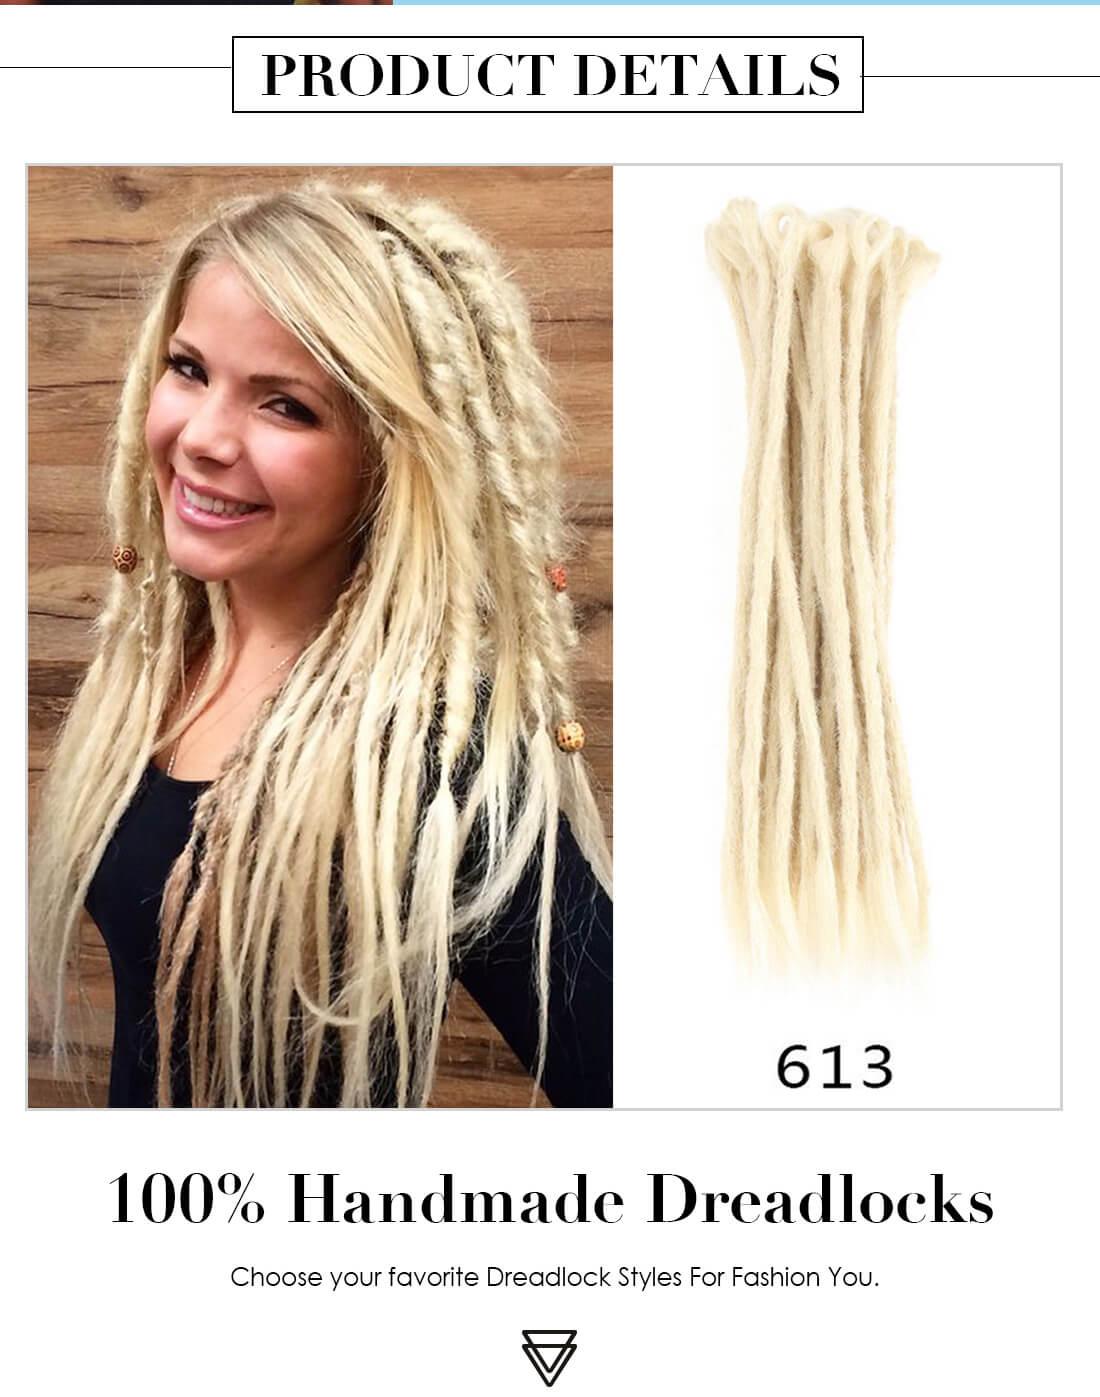 Crochet Braids With Synthetic Hair Dreadlocks